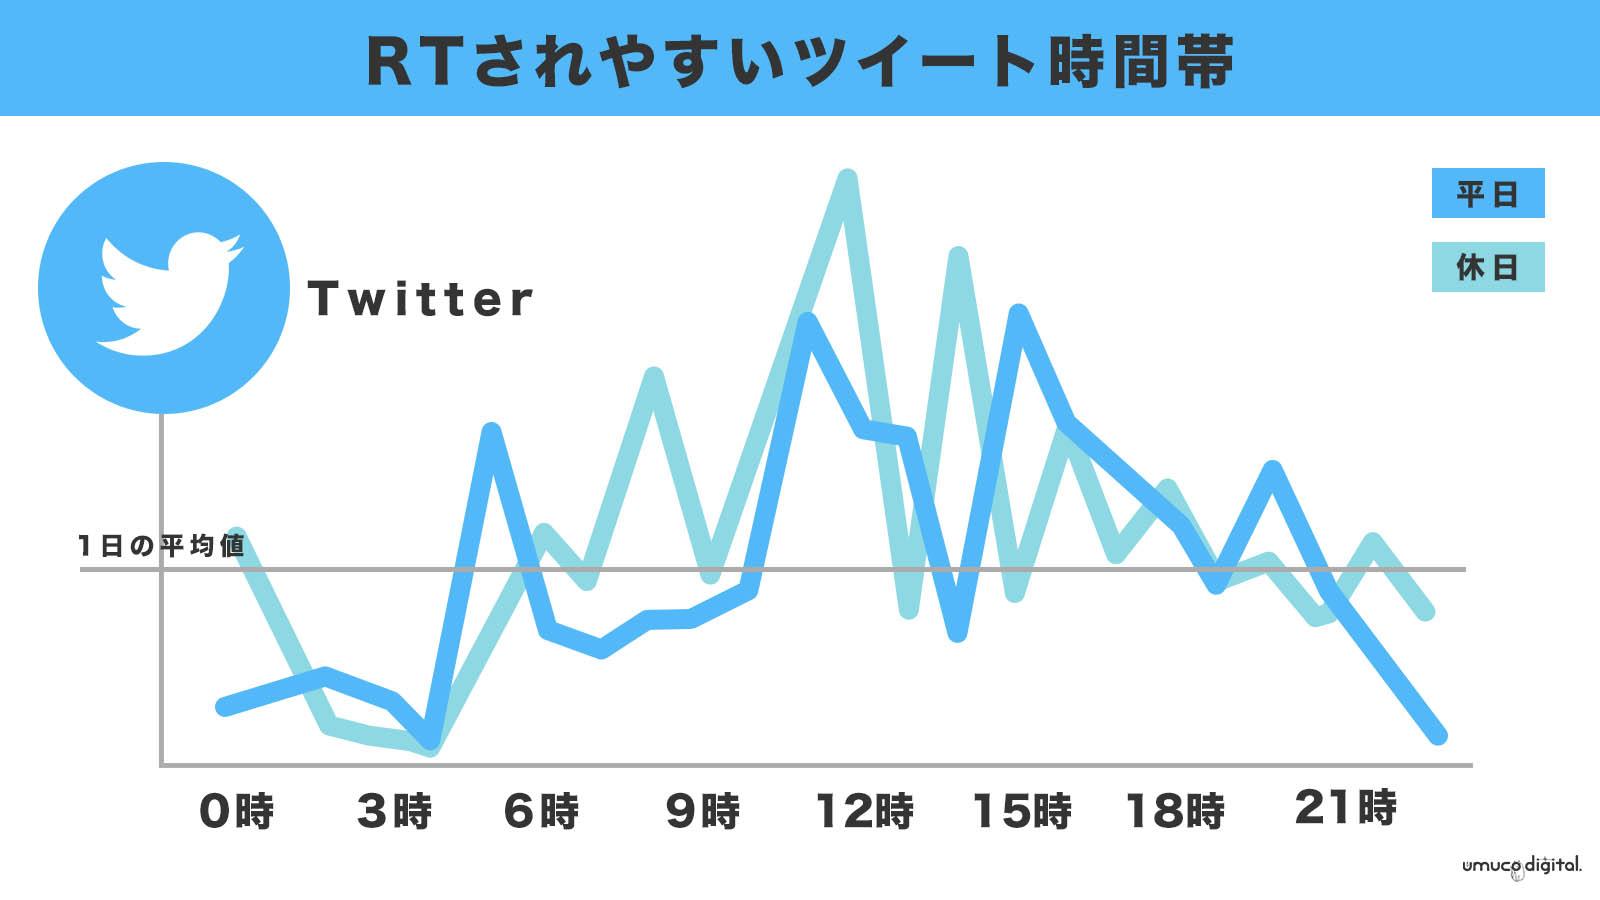 Twitter国内利用者数